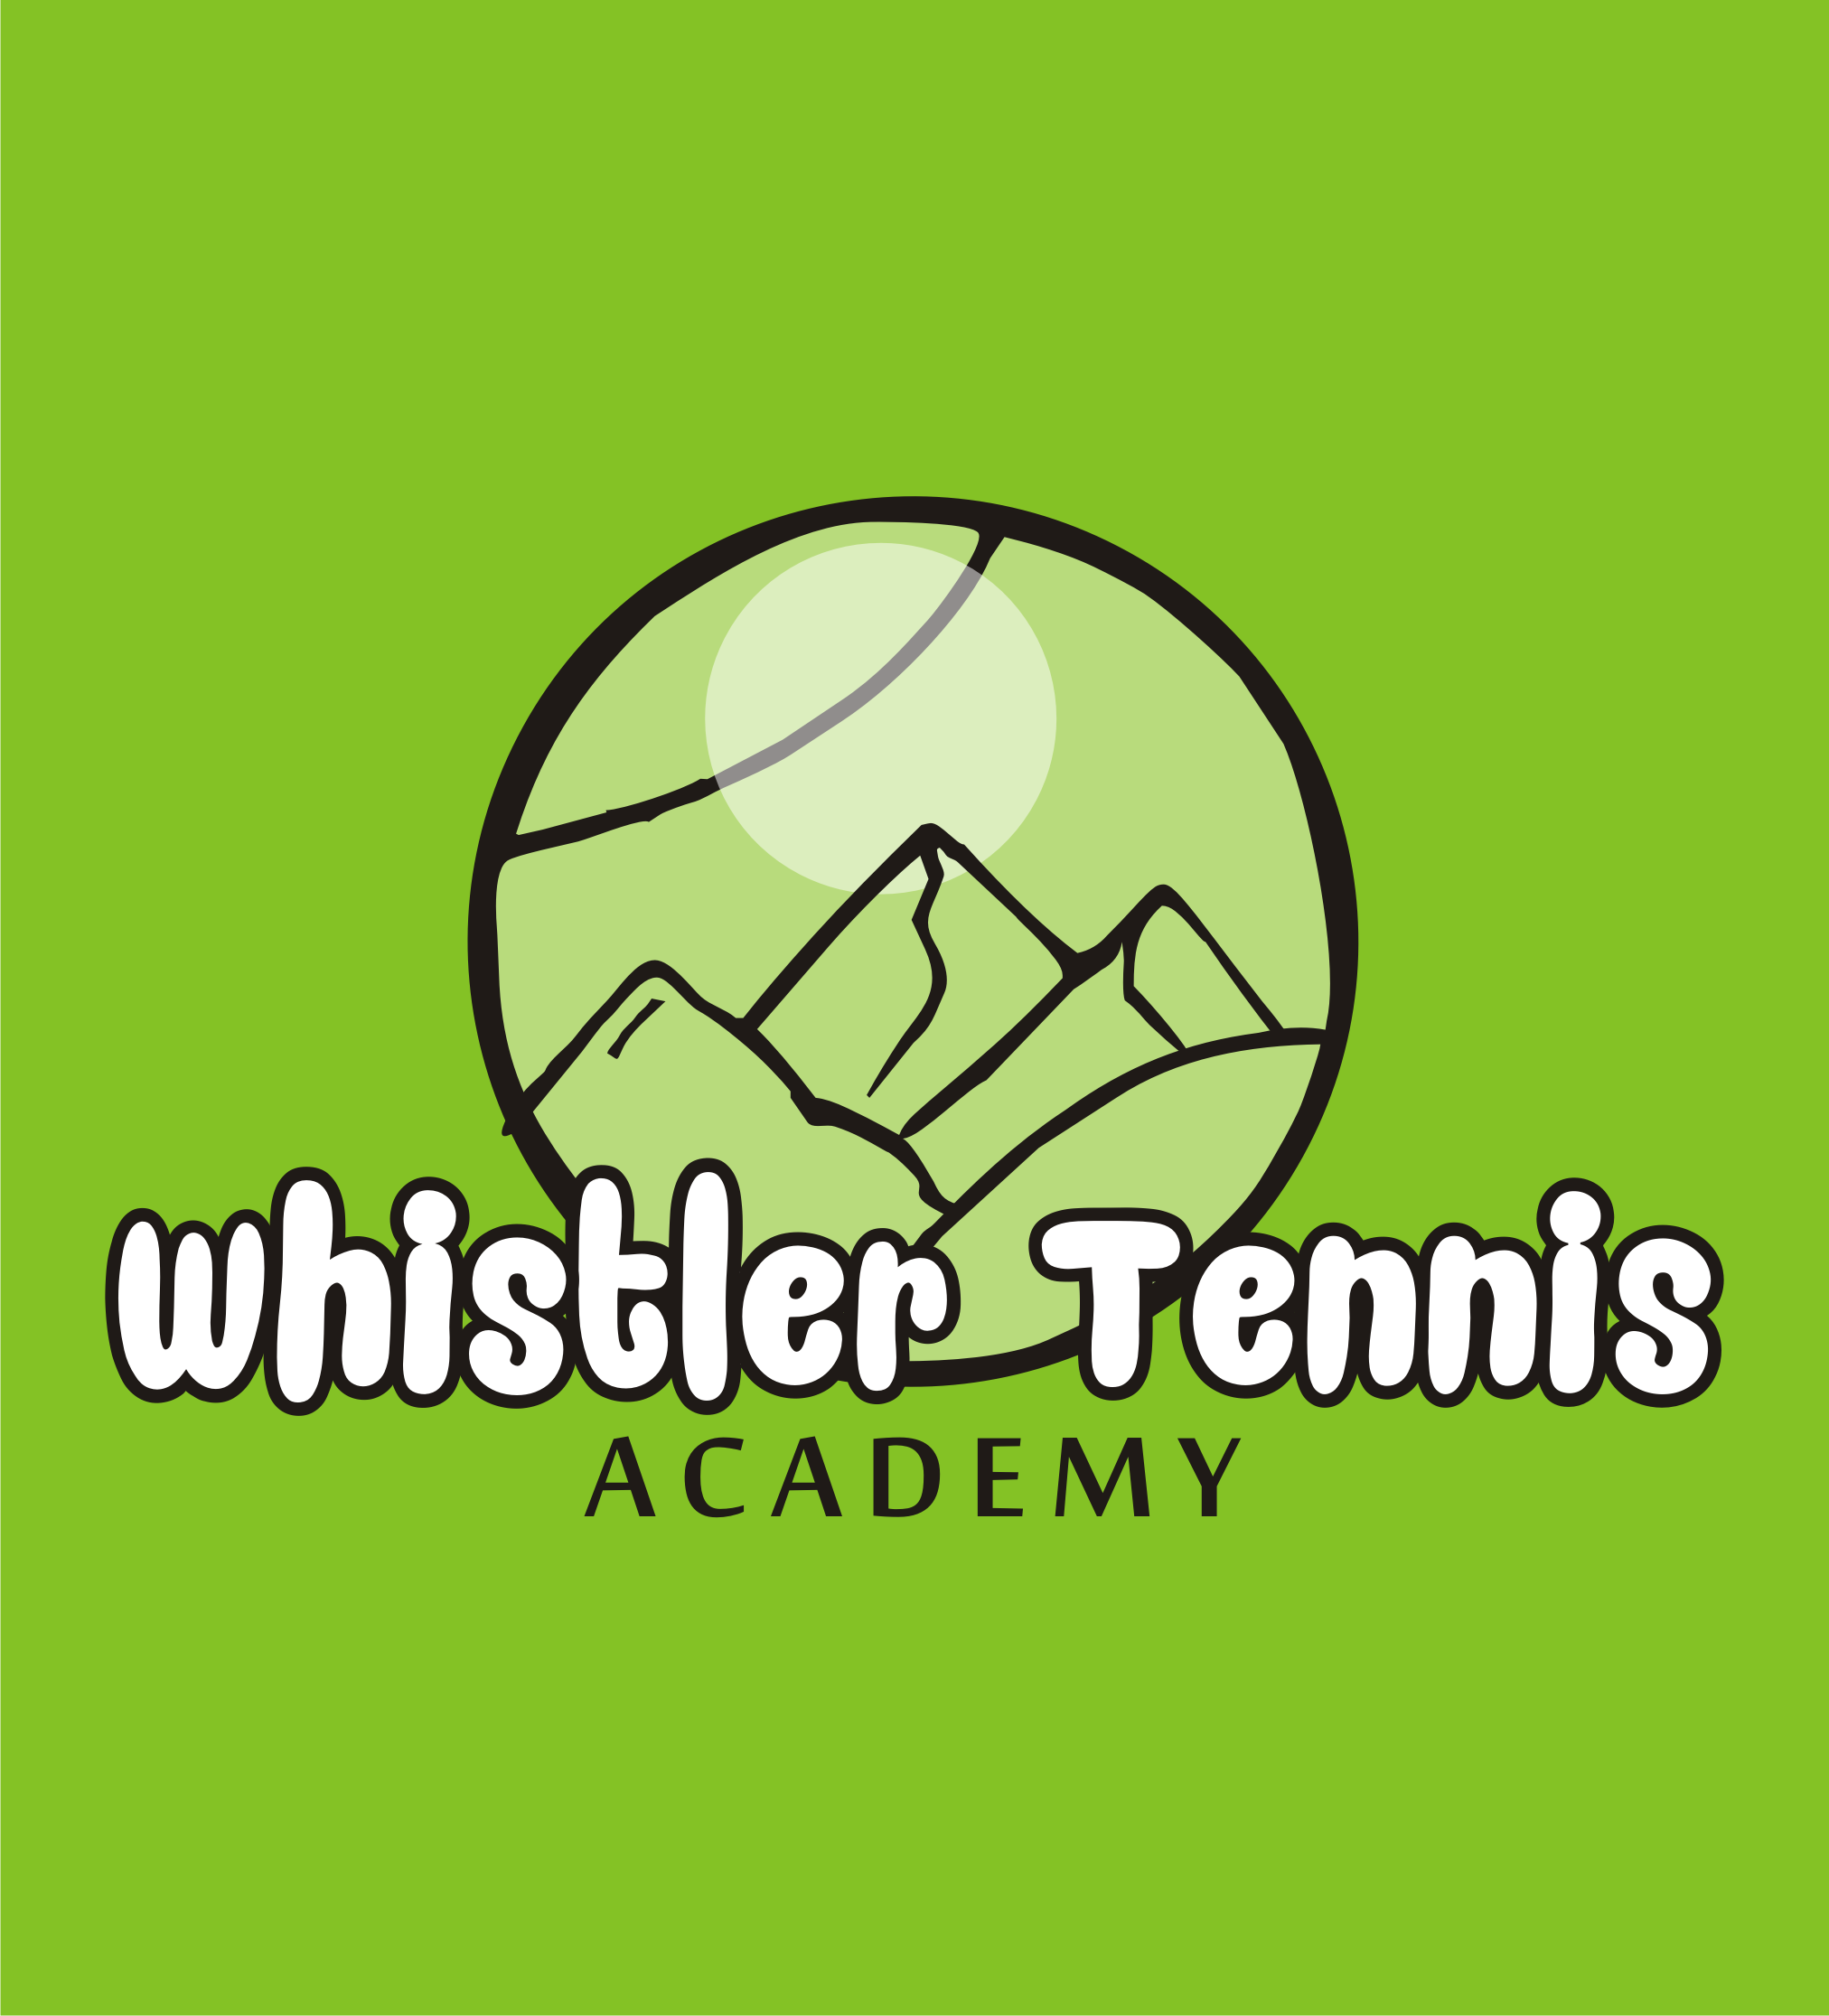 Logo Design by Nthus Nthis - Entry No. 35 in the Logo Design Contest Imaginative Logo Design for Whistler Tennis Academy.